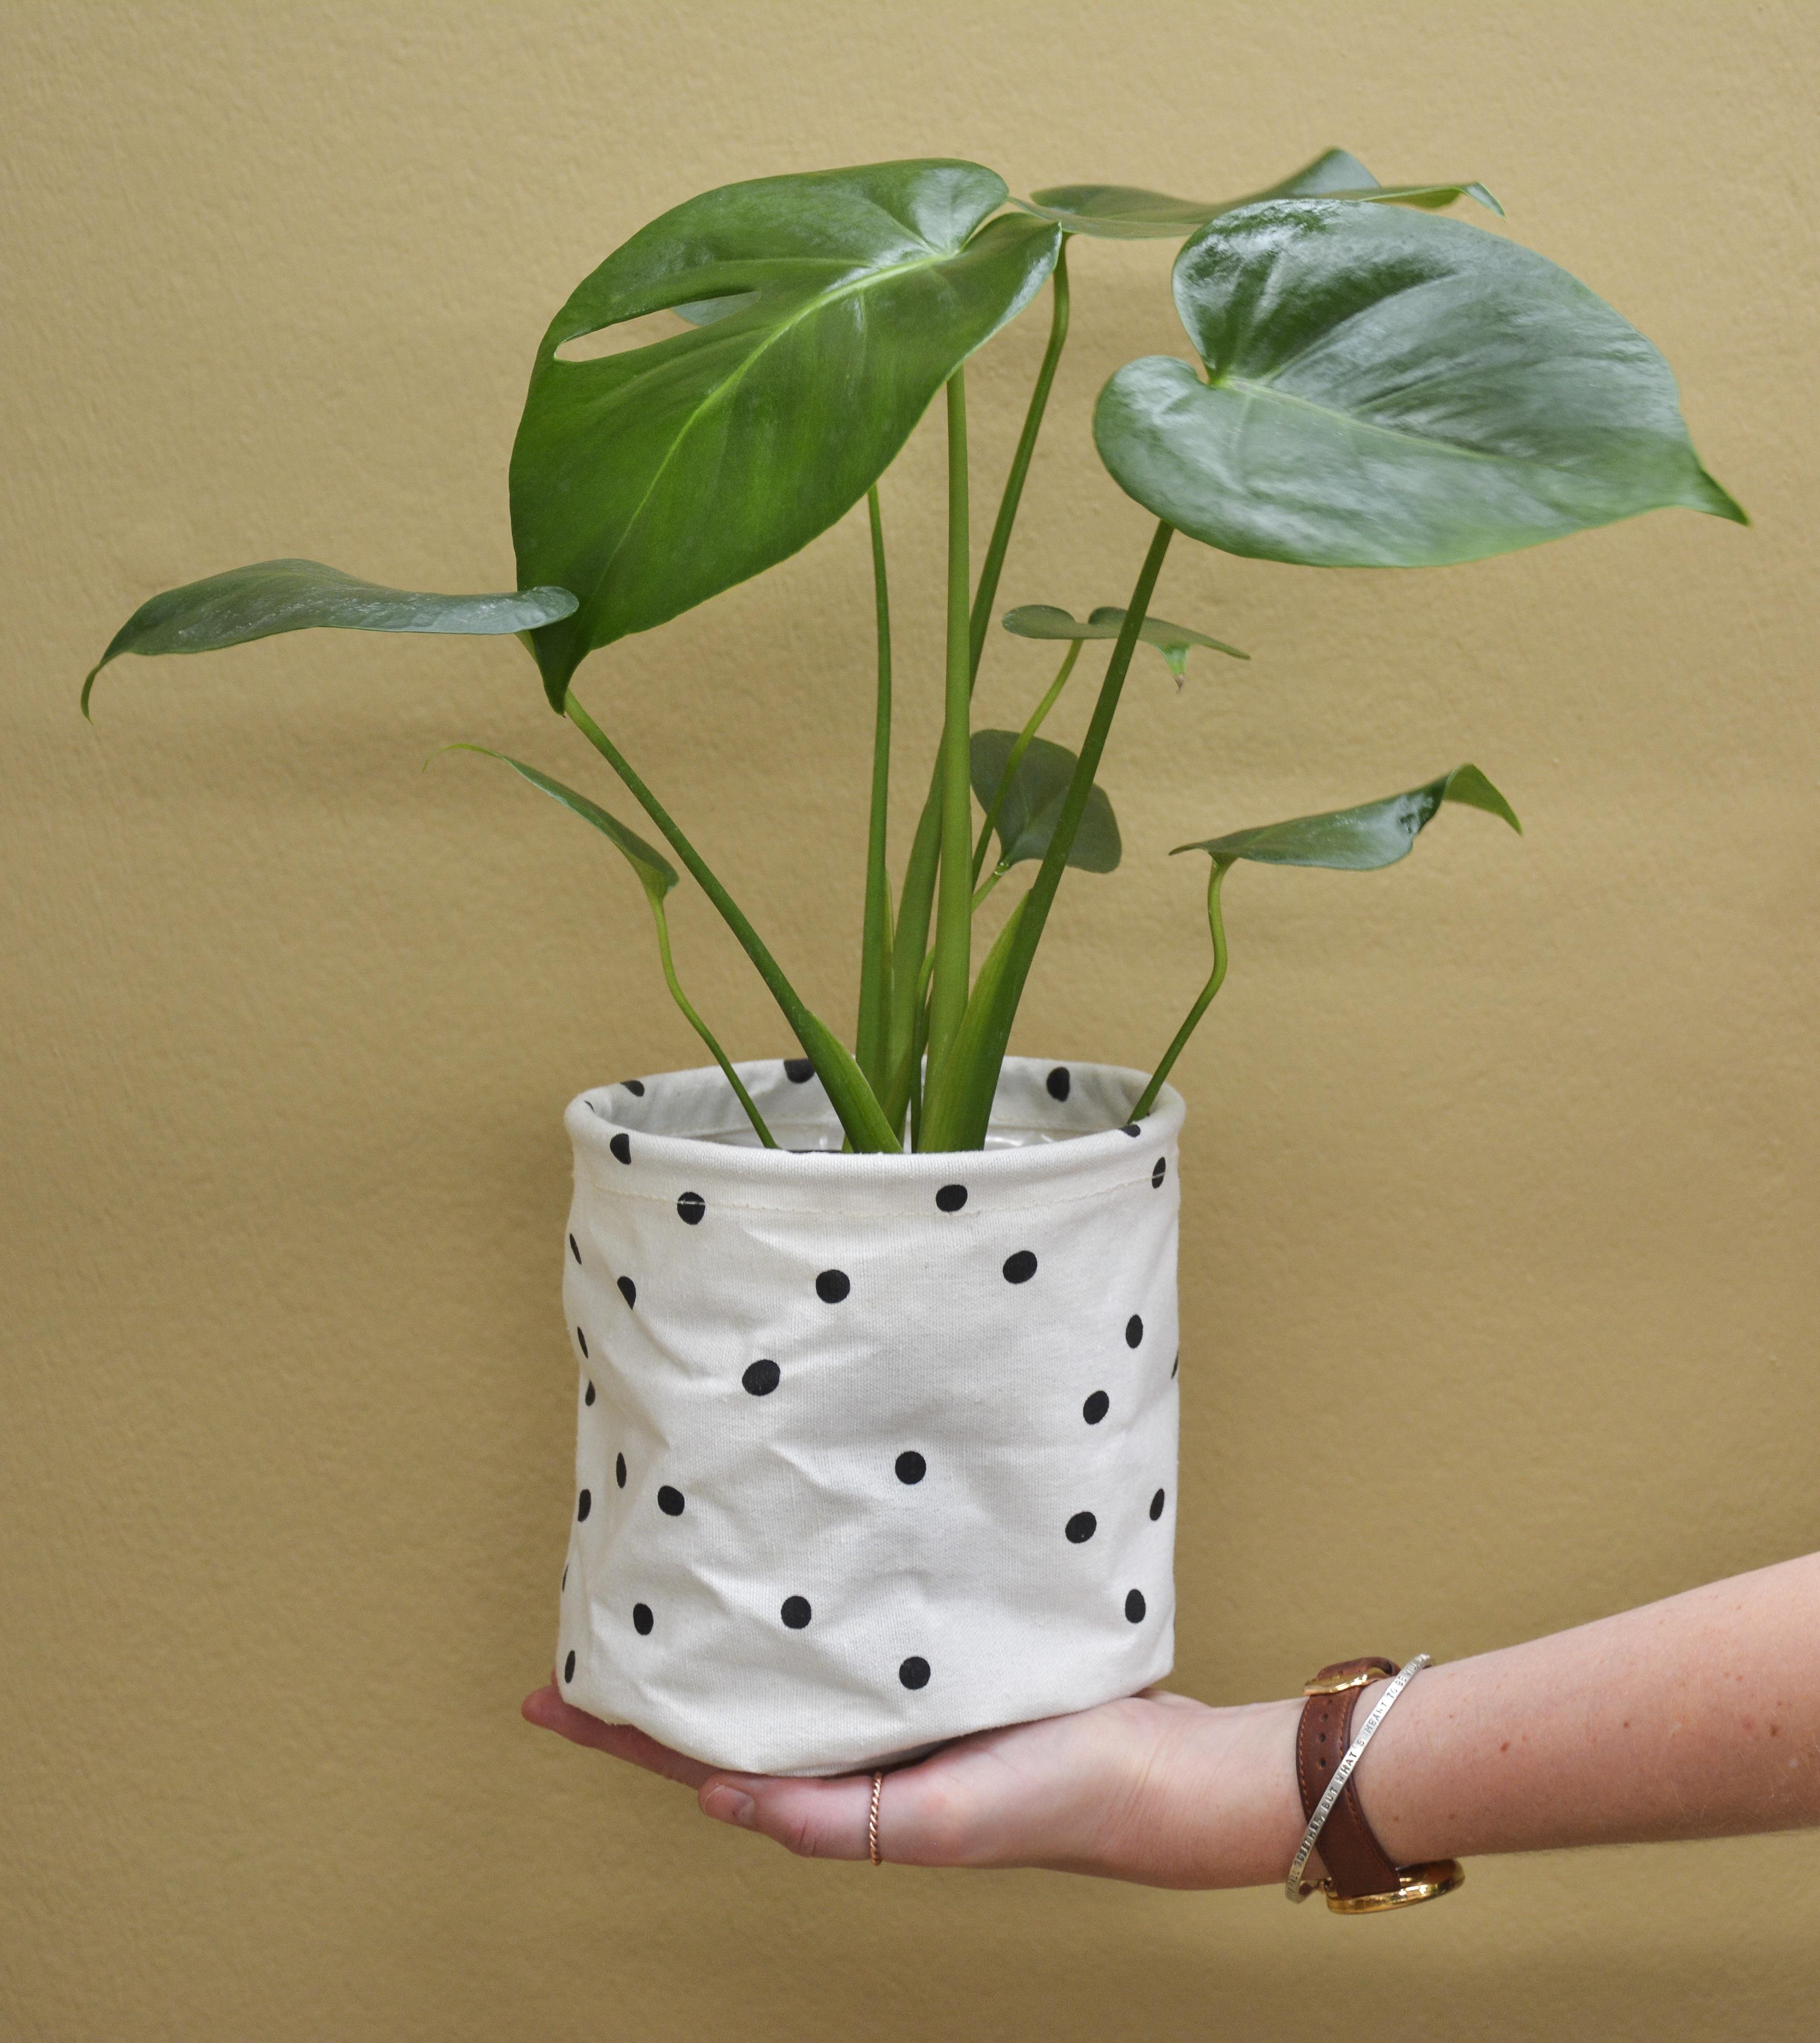 Lifestyle home garden nursery plant shop indoor plant care plants gardening johannesburg gauteng